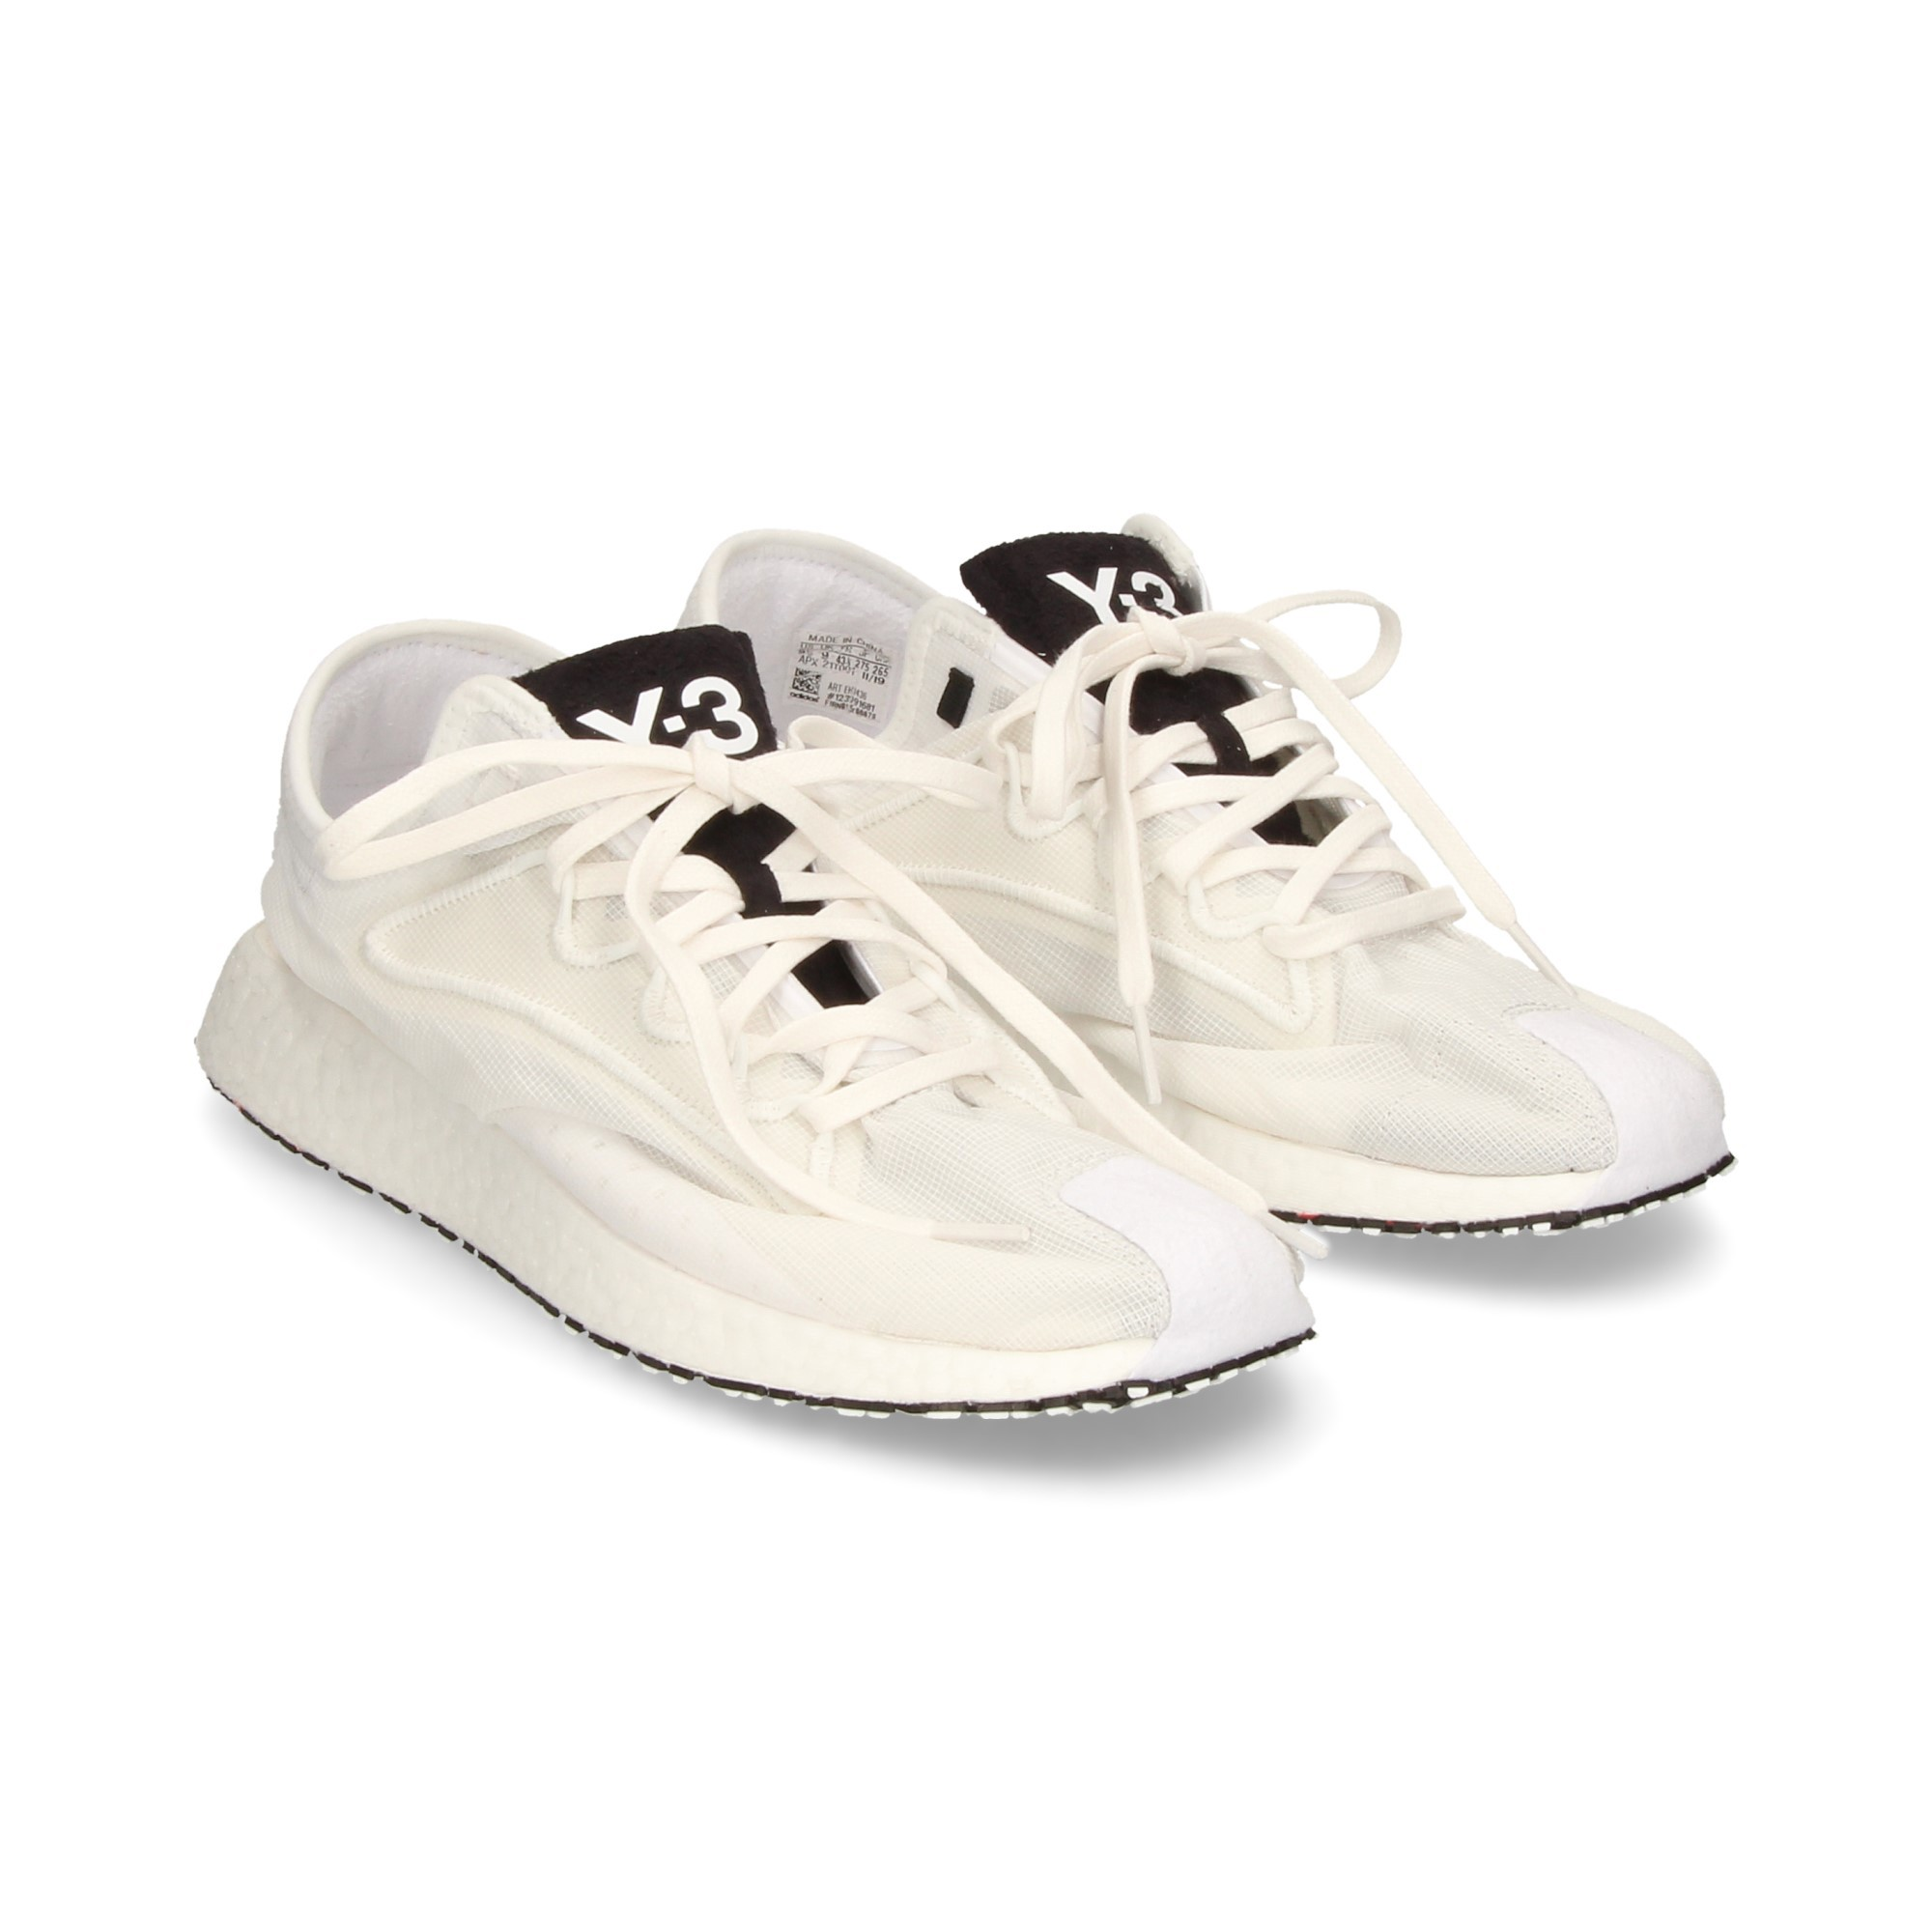 Adidas Y 3 Scarpe Sportive Raito Racer Bianco Uomo Scarpe da